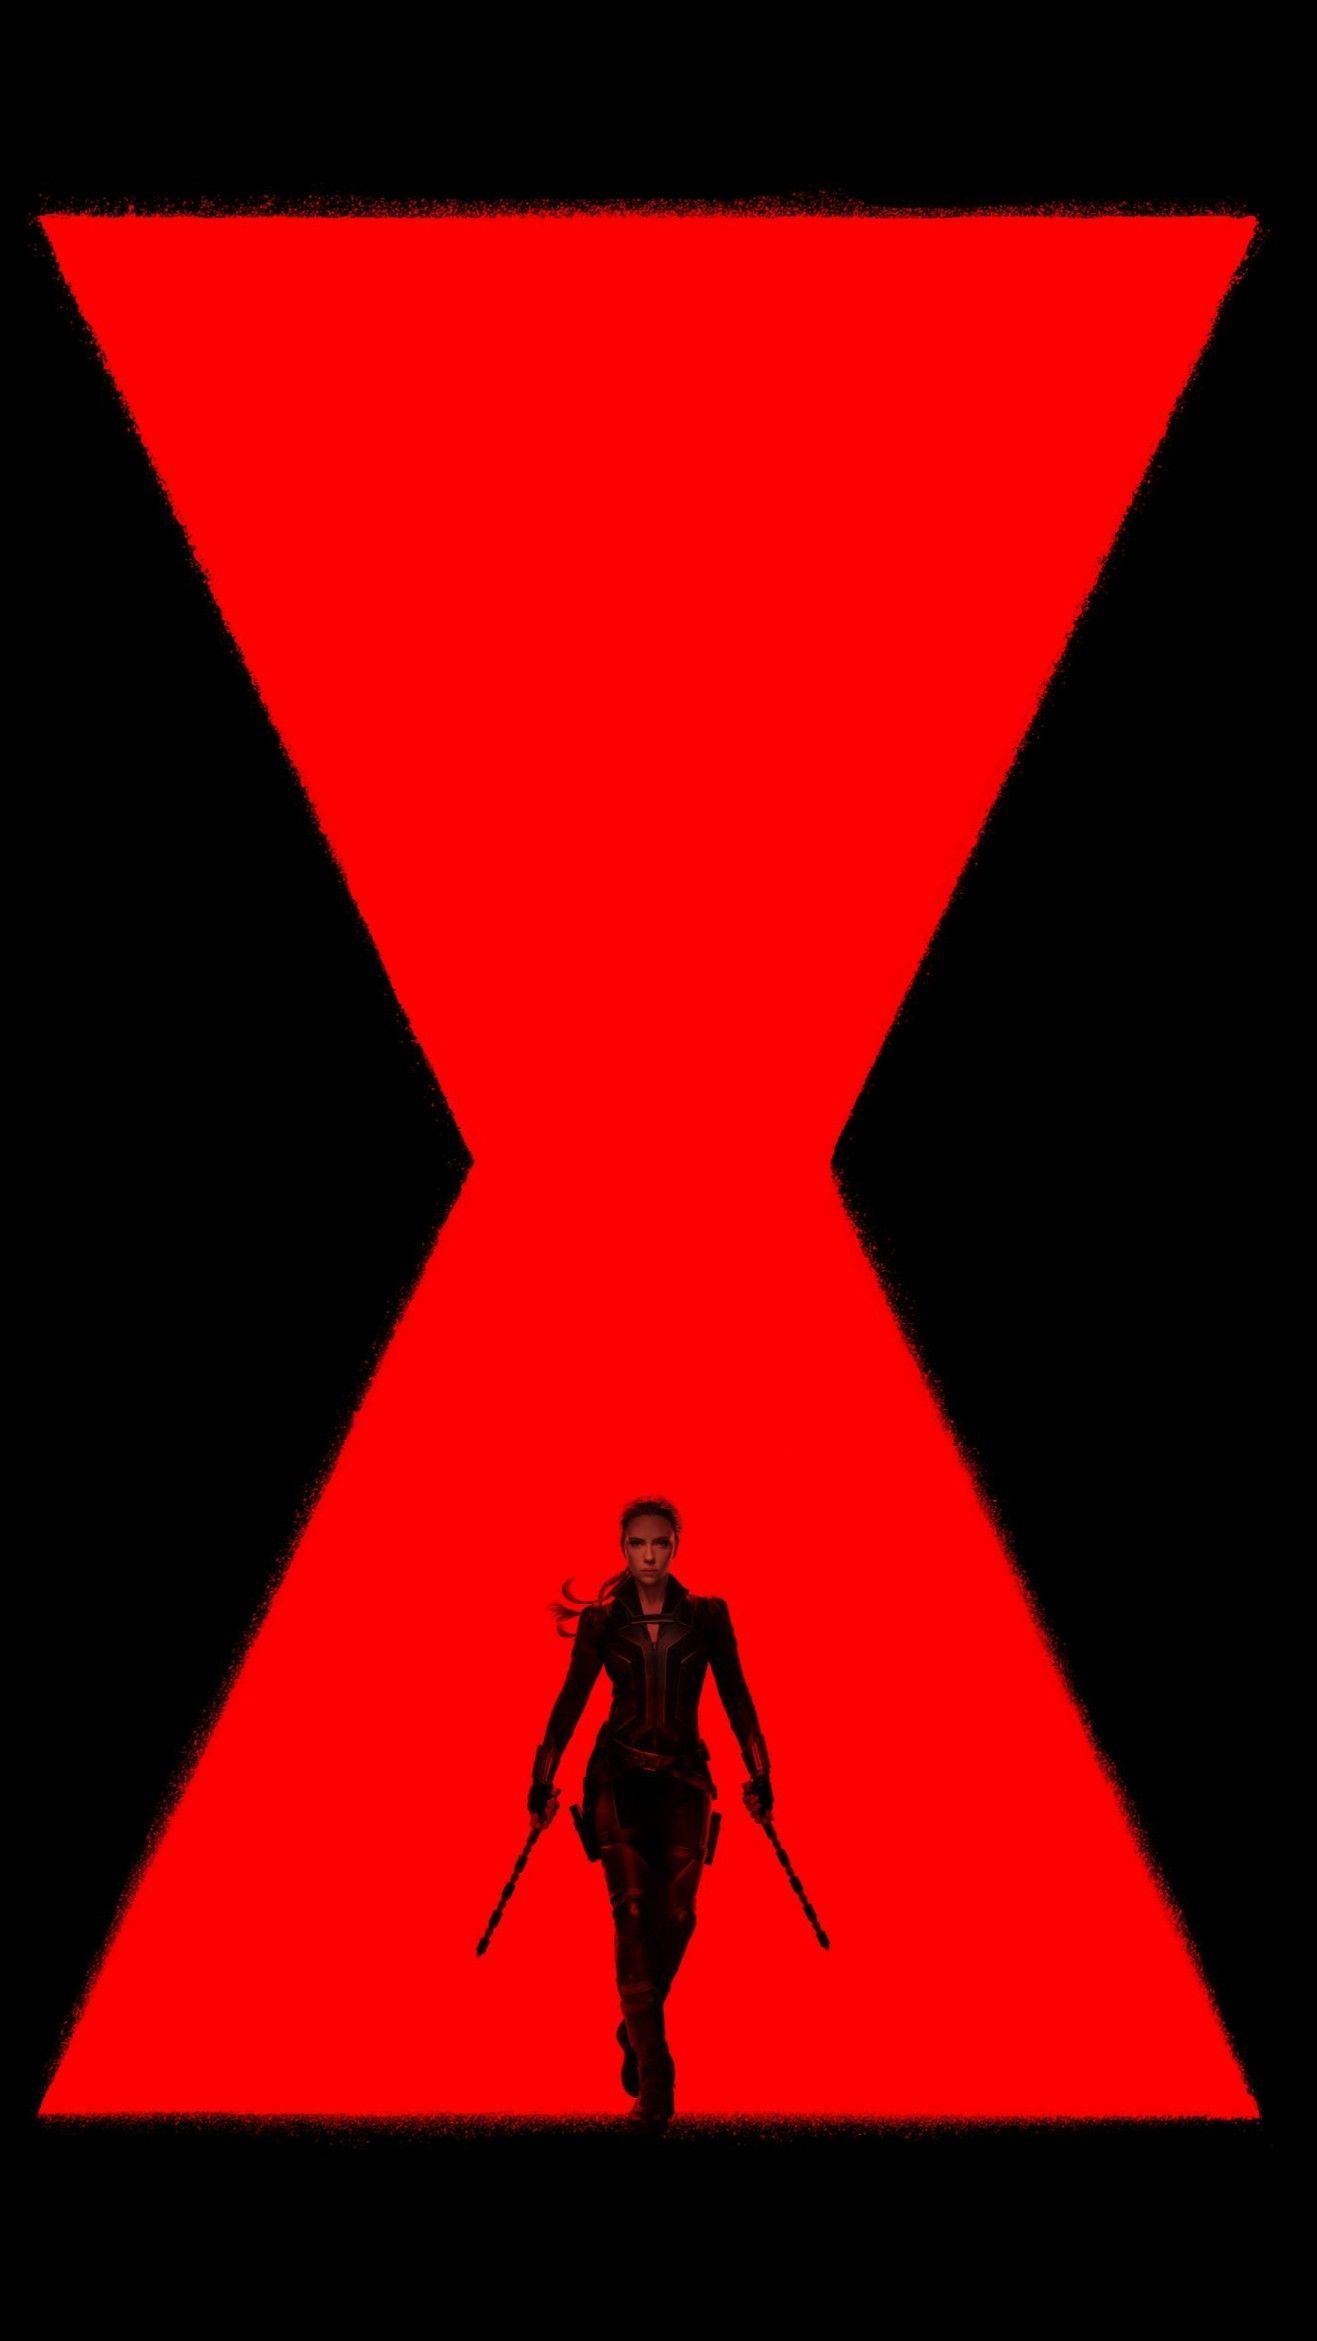 Pin By Gabriel Martinez On Marvel Cinematic Universe Black Widow Wallpaper Black Widow Marvel Black Widow Movie